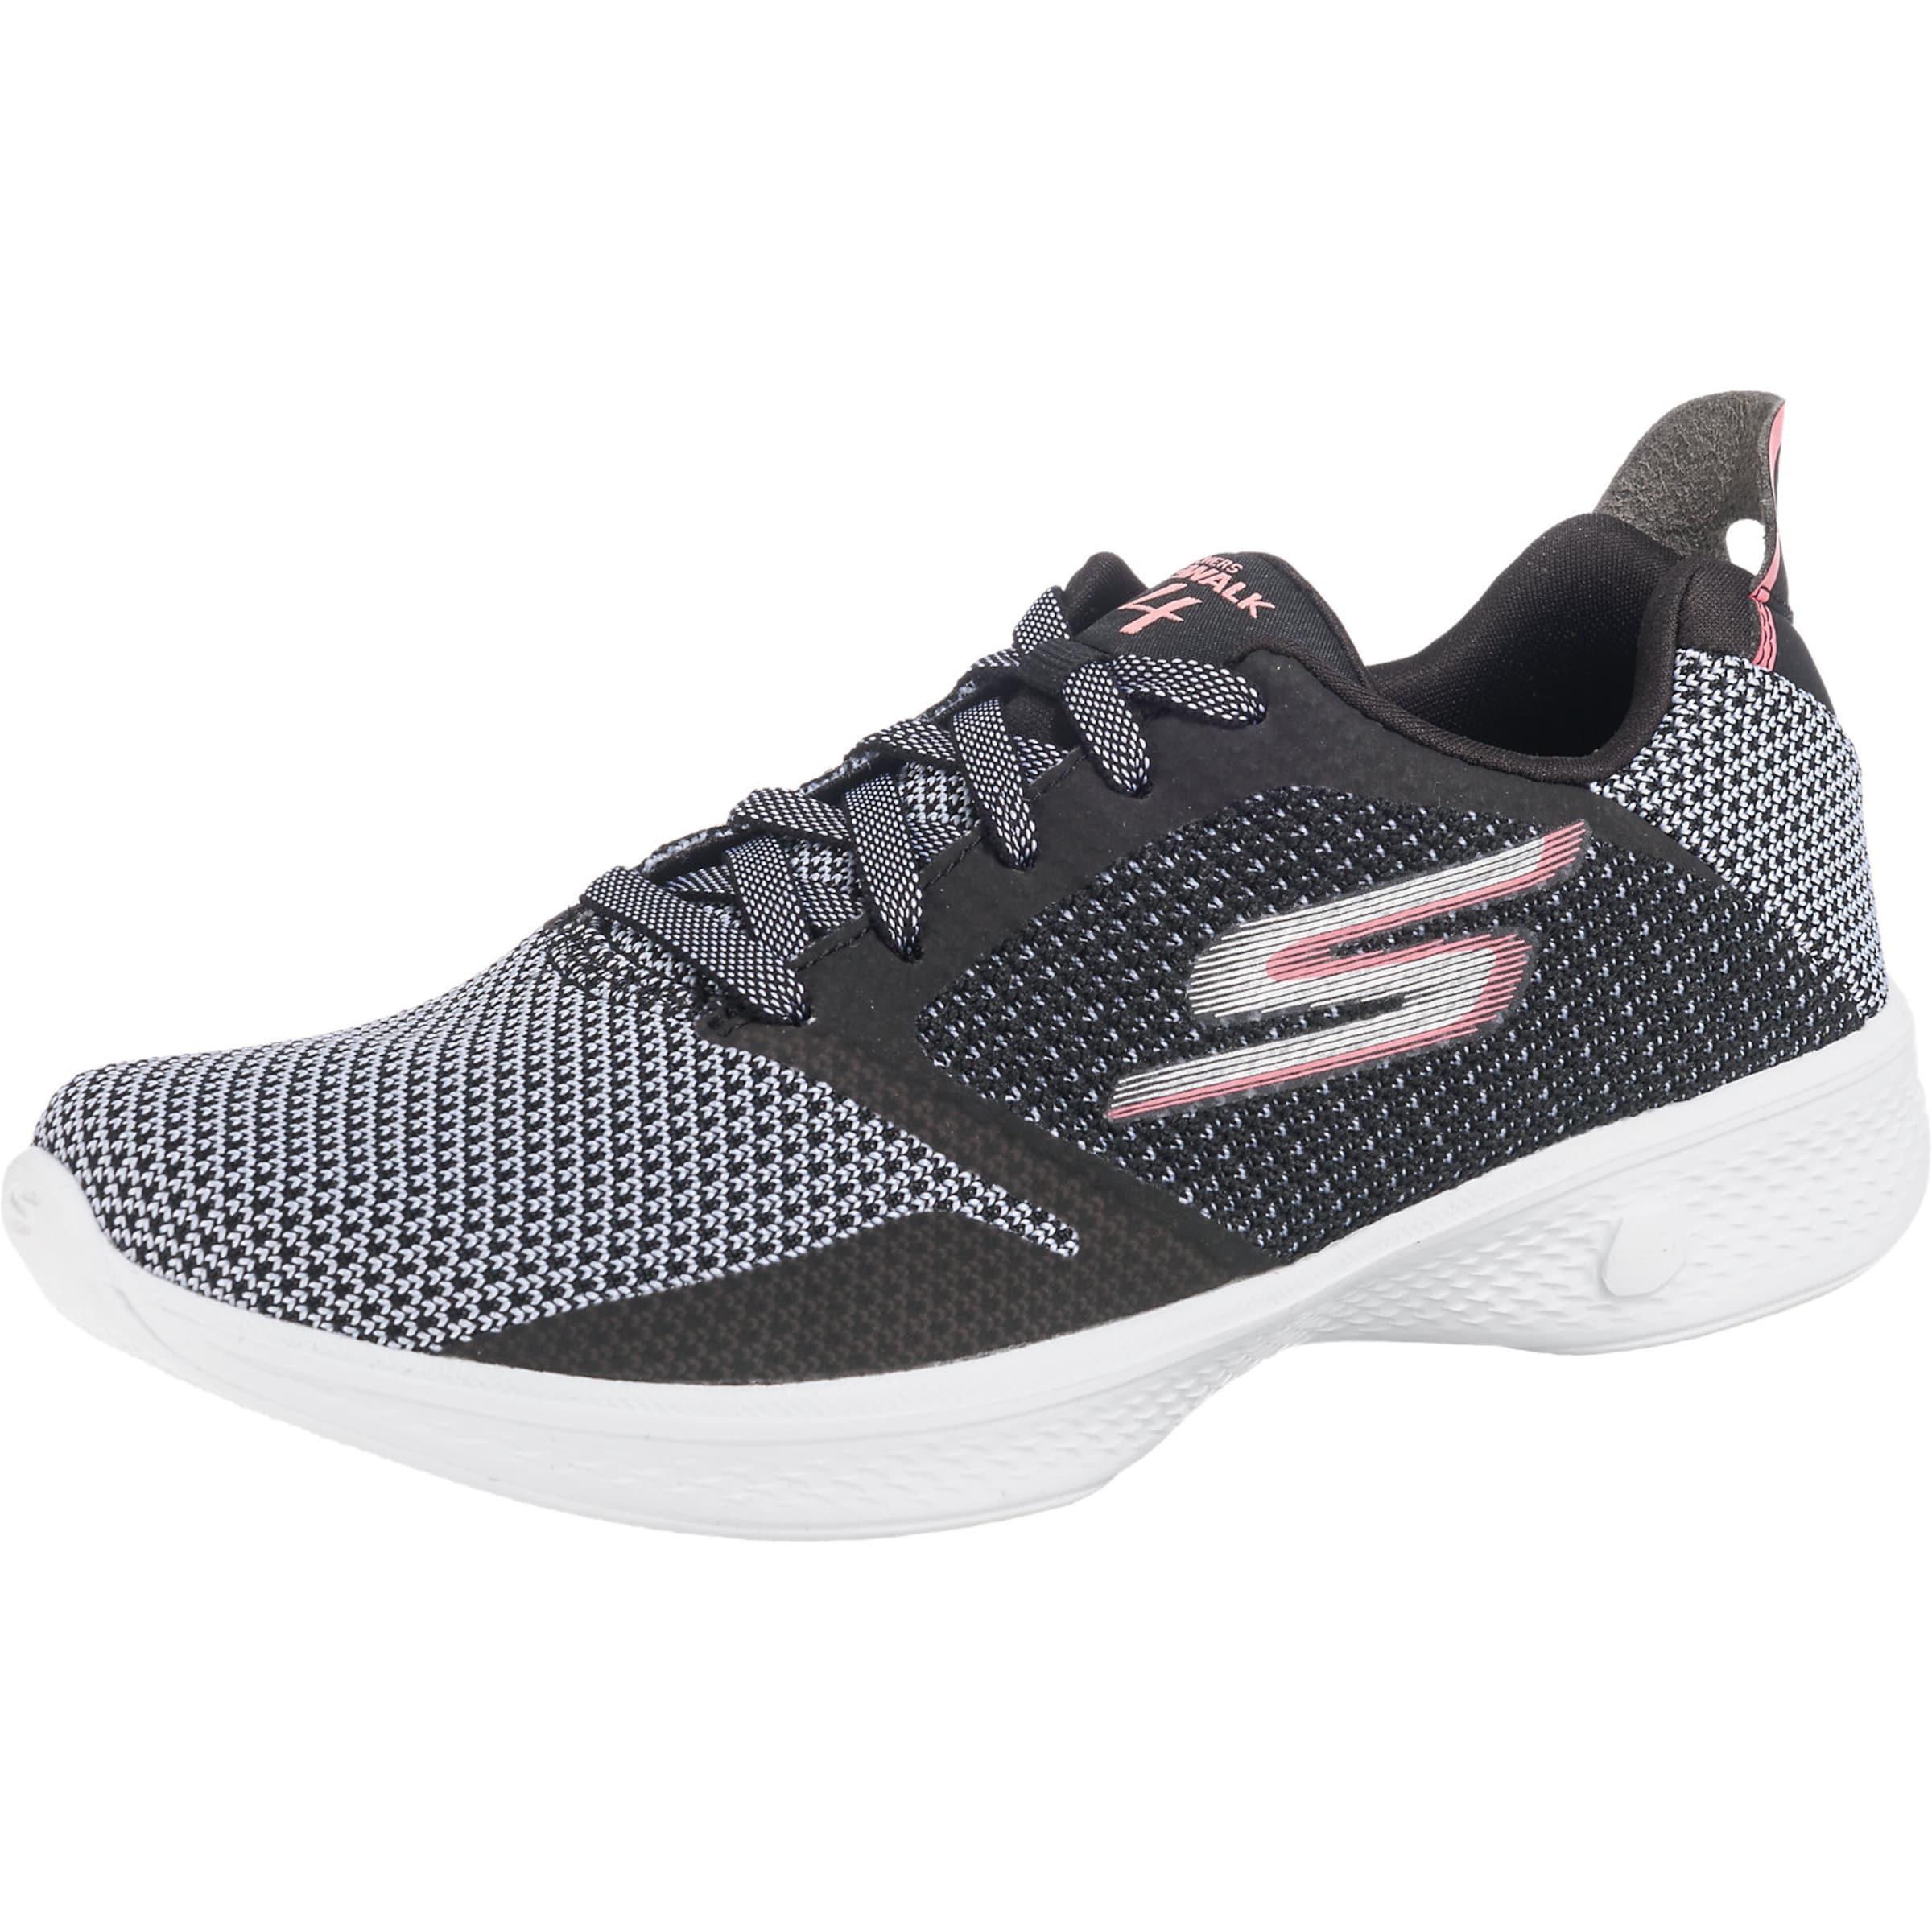 4' Walk 4' Sneakers Walk 'Go SKECHERS SKECHERS Low 'Go xYwEBqwH41